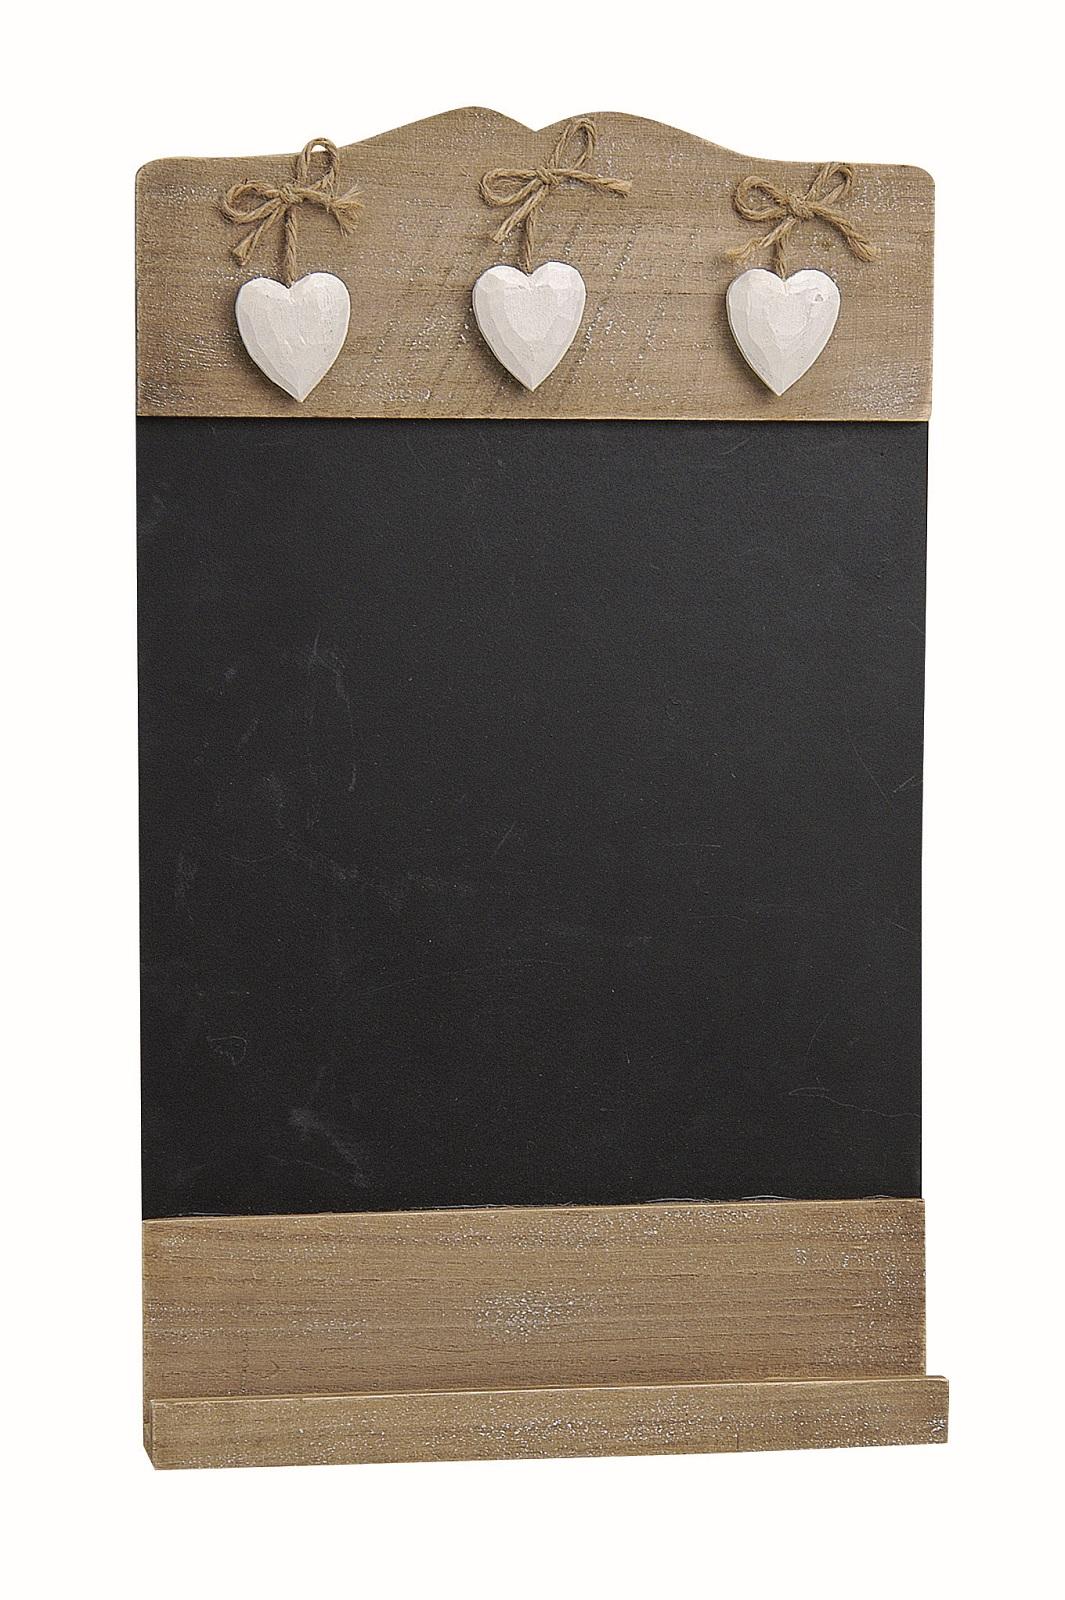 Memo Tafel zum hängen mit 3 Herzen